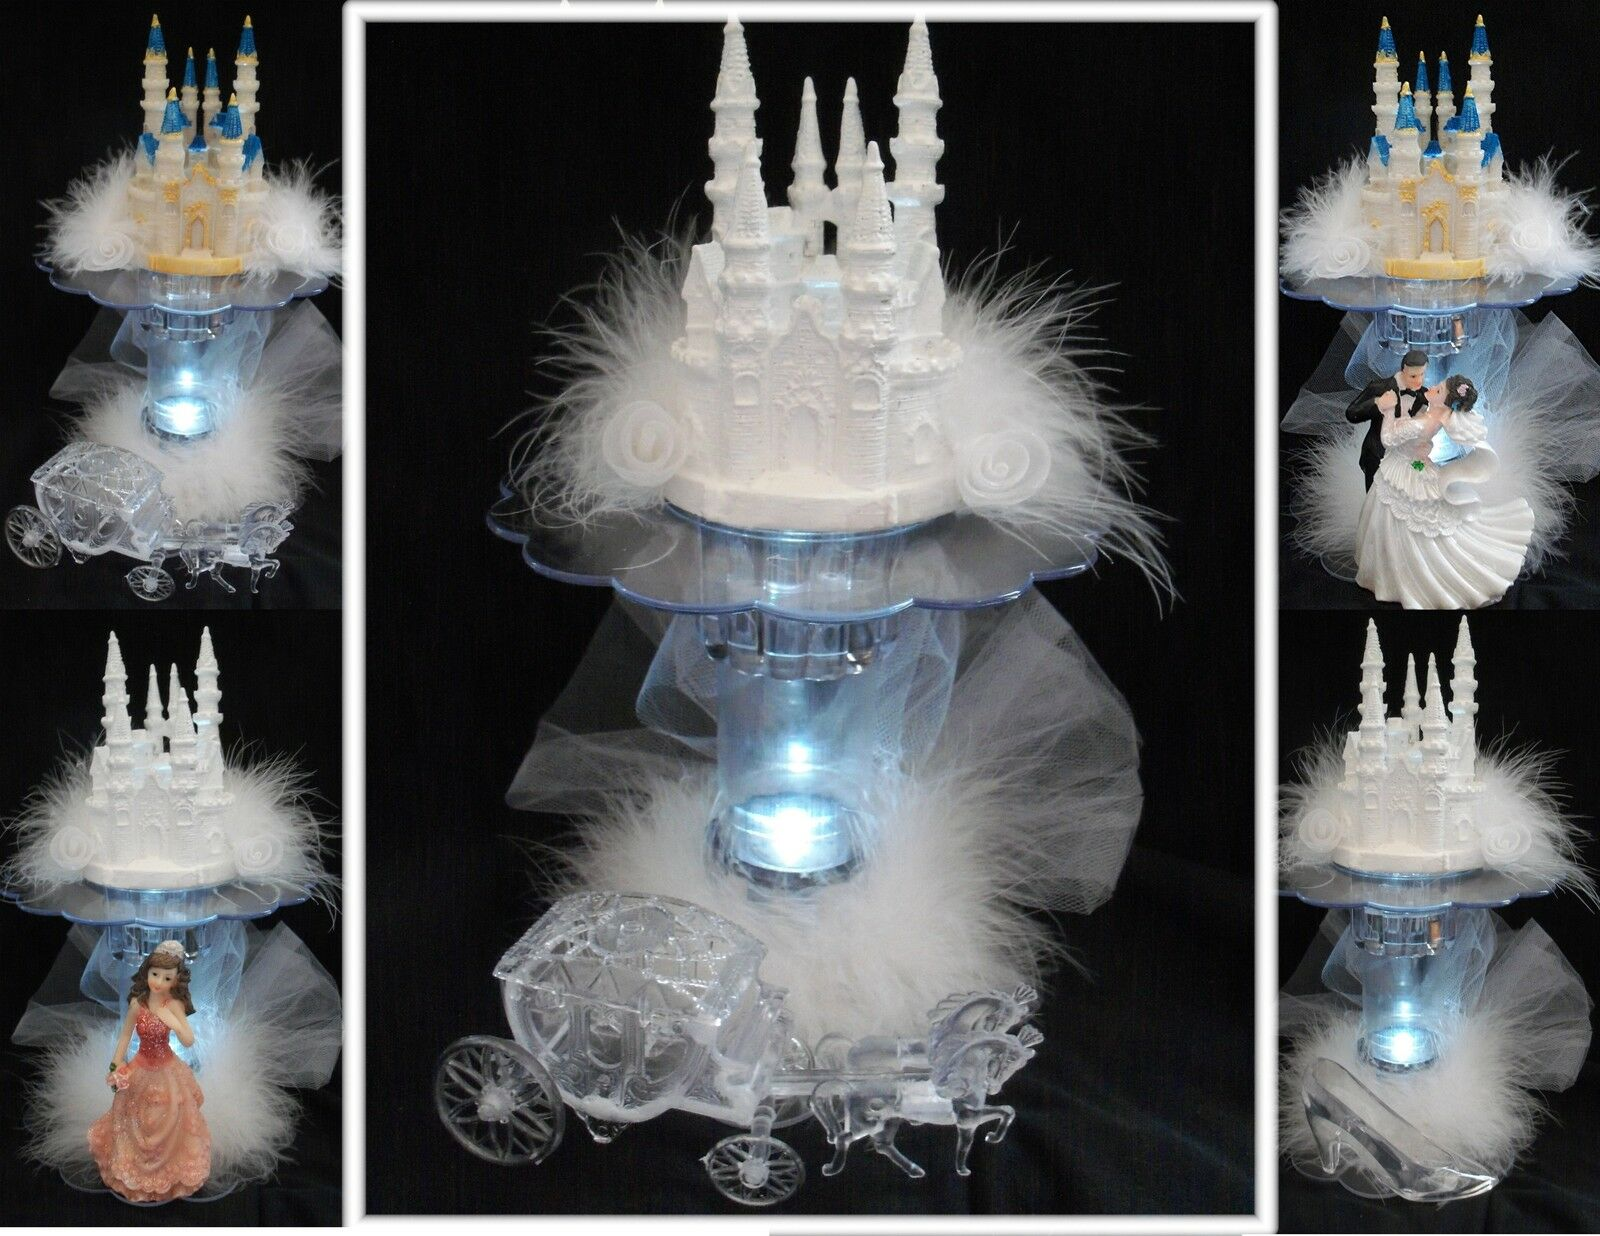 Lighted Bridal Wedding Cake Topper Quince Castle Light